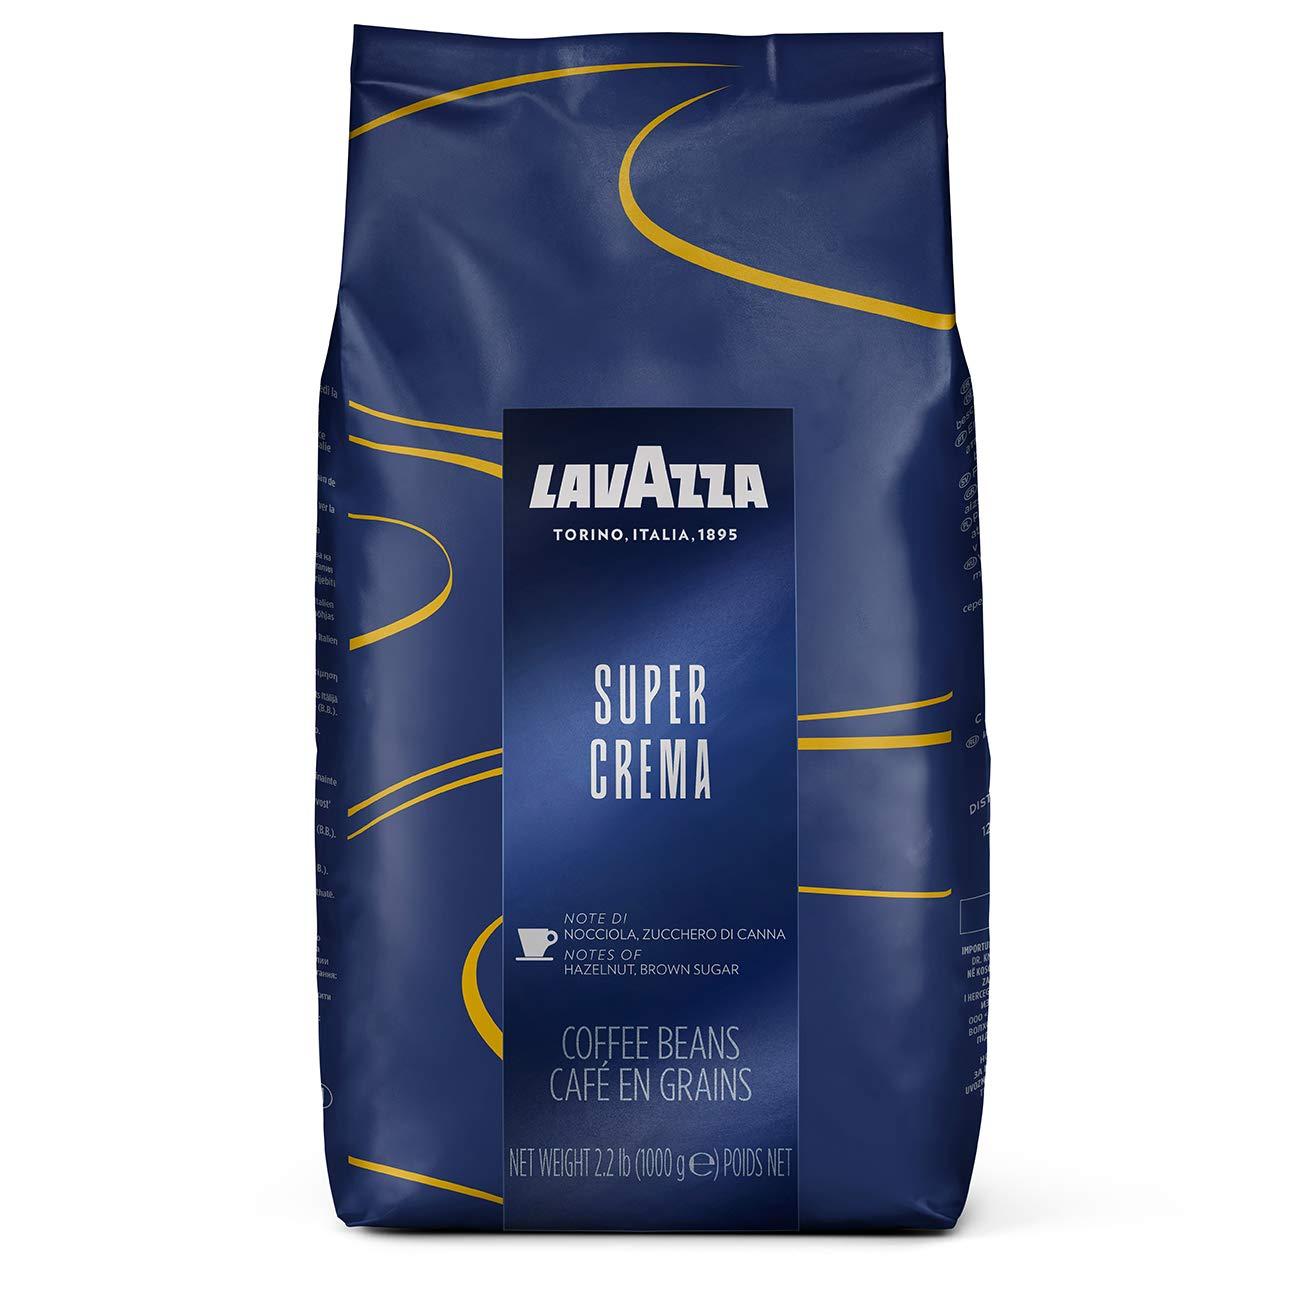 Lavazza Super Crema Whole Bean Coffee Blend, Medium Espresso Roast, 2.2 Pound (Pack of 1) by Lavazza